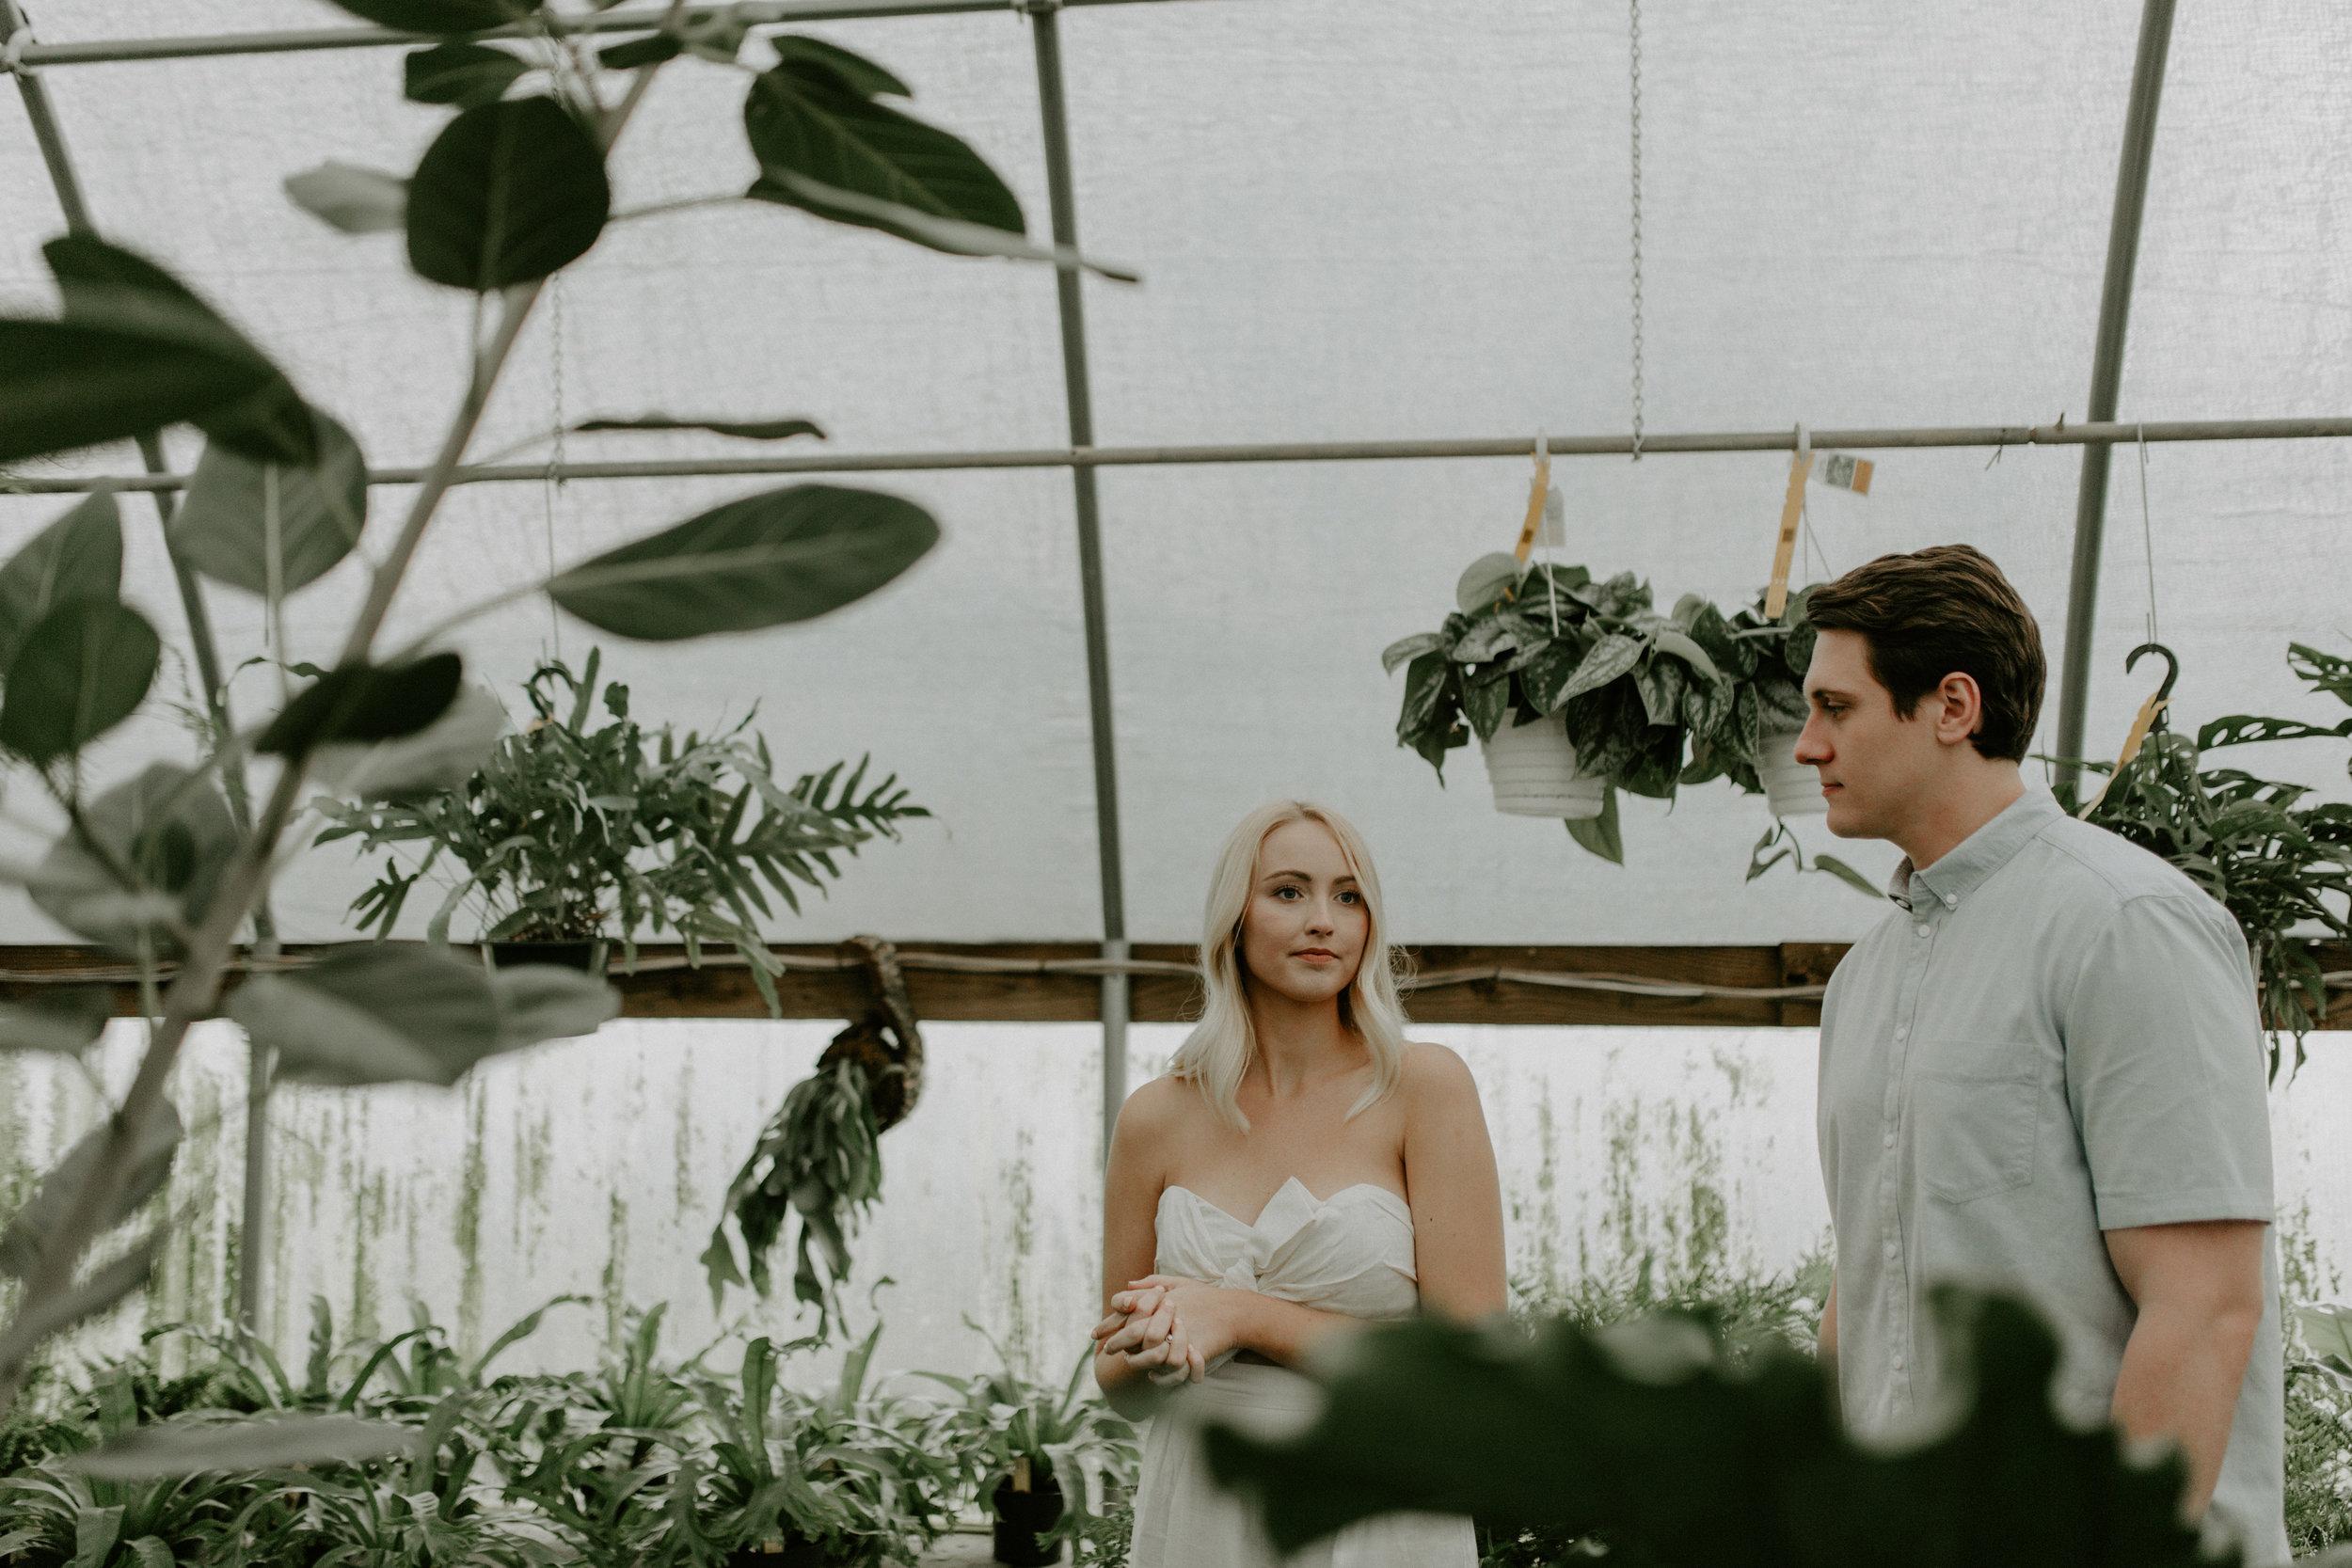 nashville_tn_wedding_photographer_collab_wright_photographs_0058.JPG